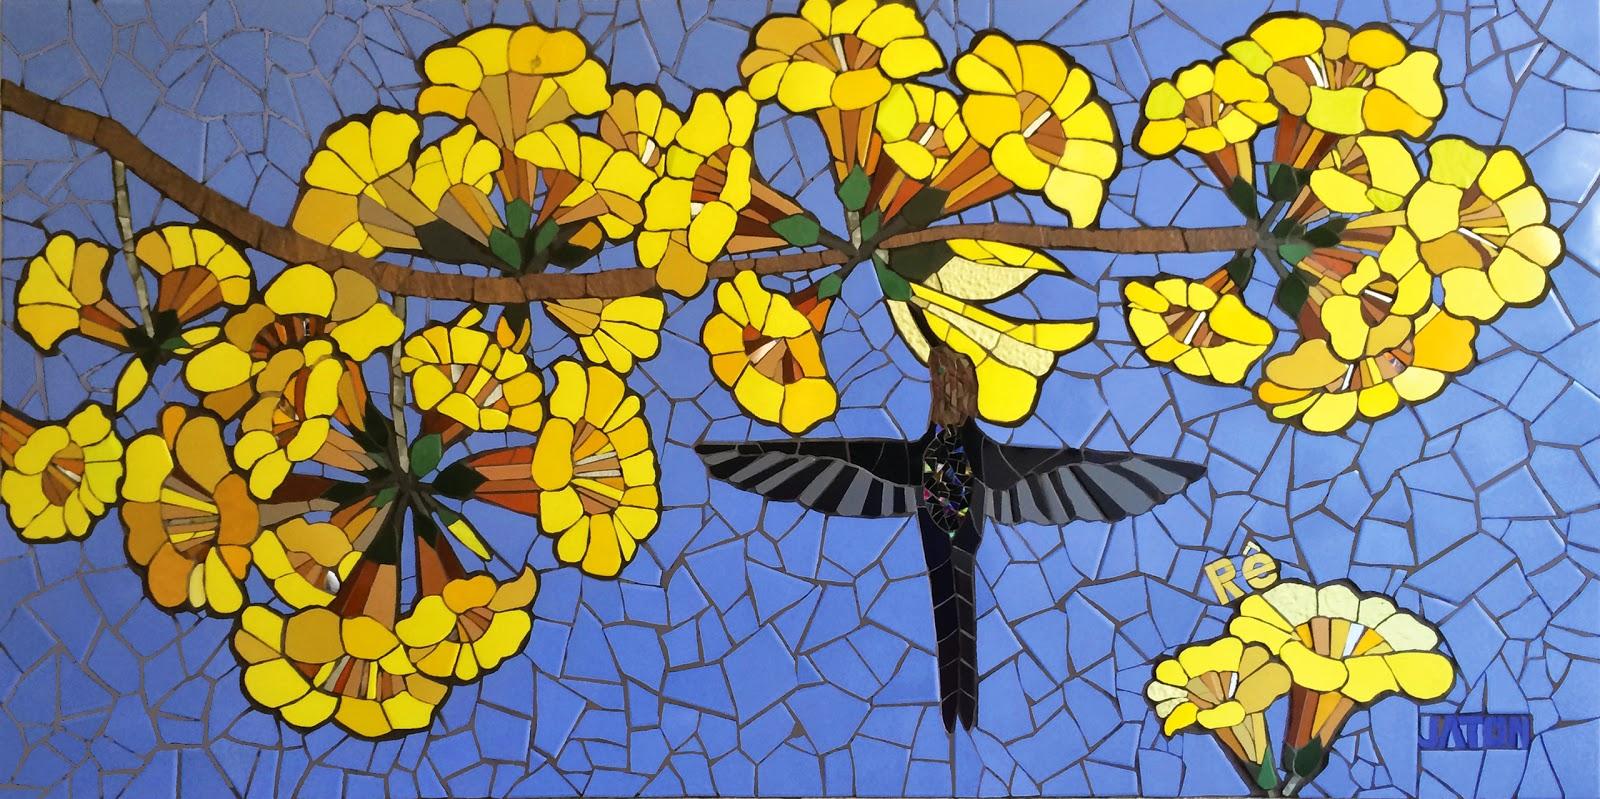 Mosaico creativo de fj mosaic art for El mural de mosaicos